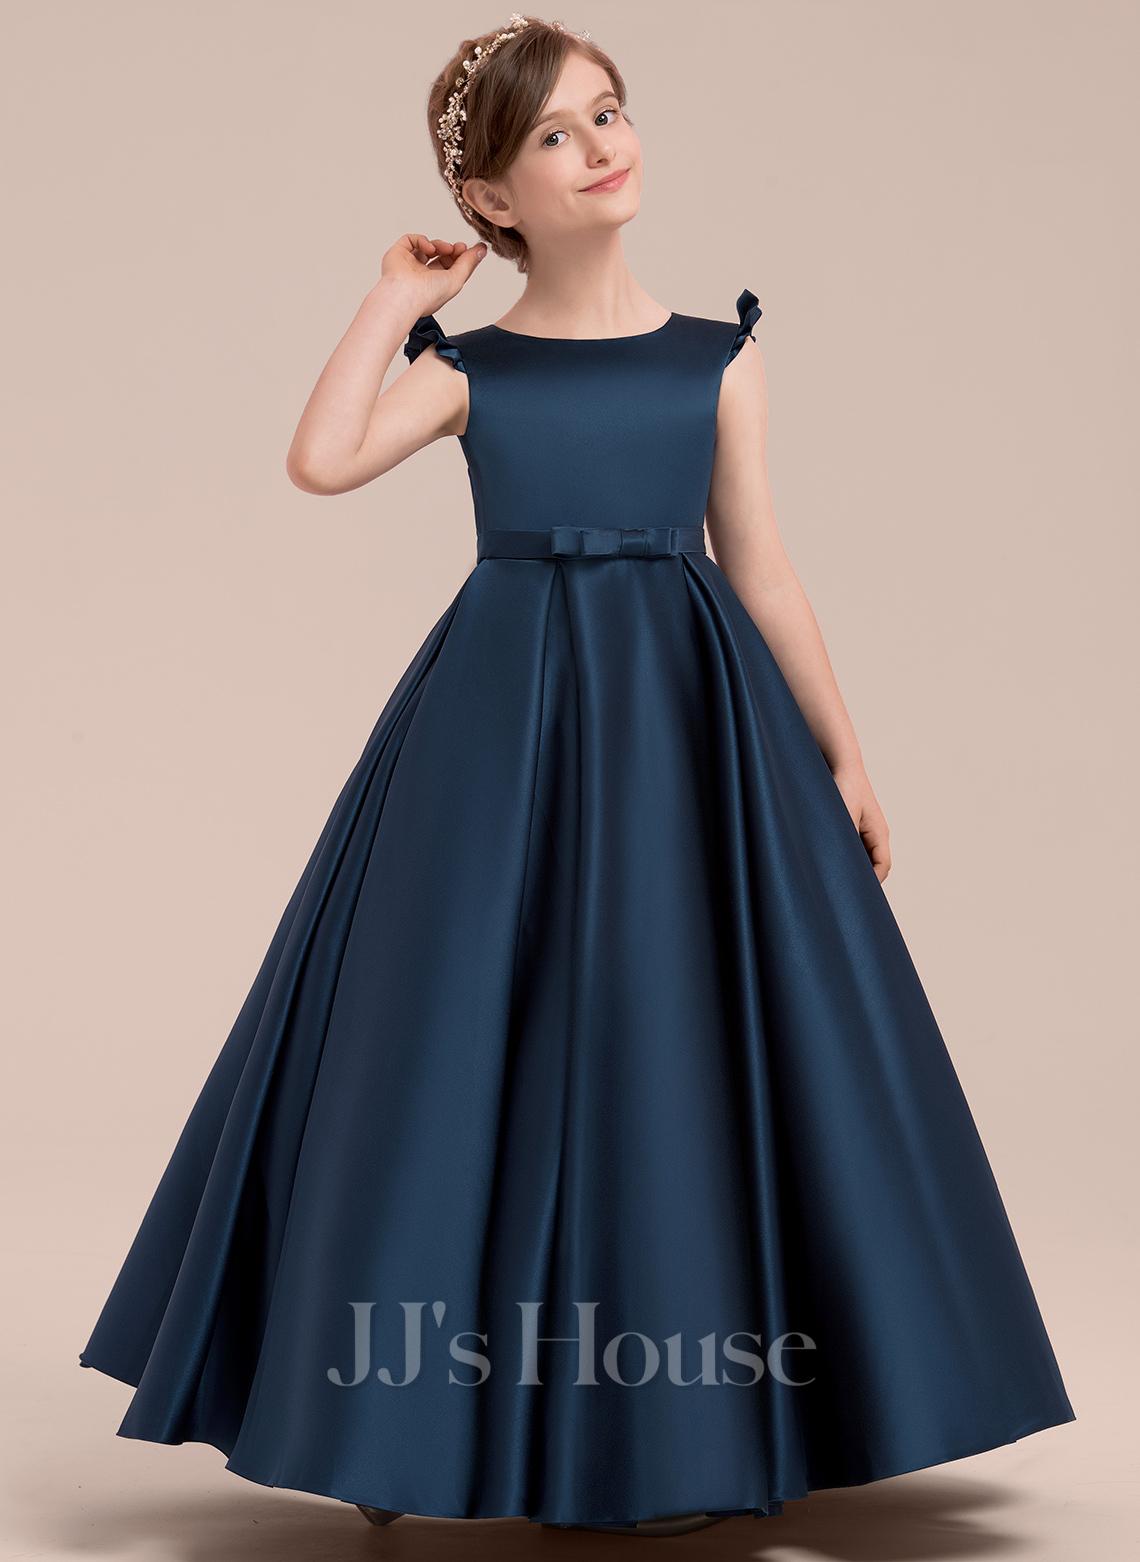 Ball Gown Floor-length Flower Girl Dress - Satin Sleeveless Scoop Neck With Bow(s)